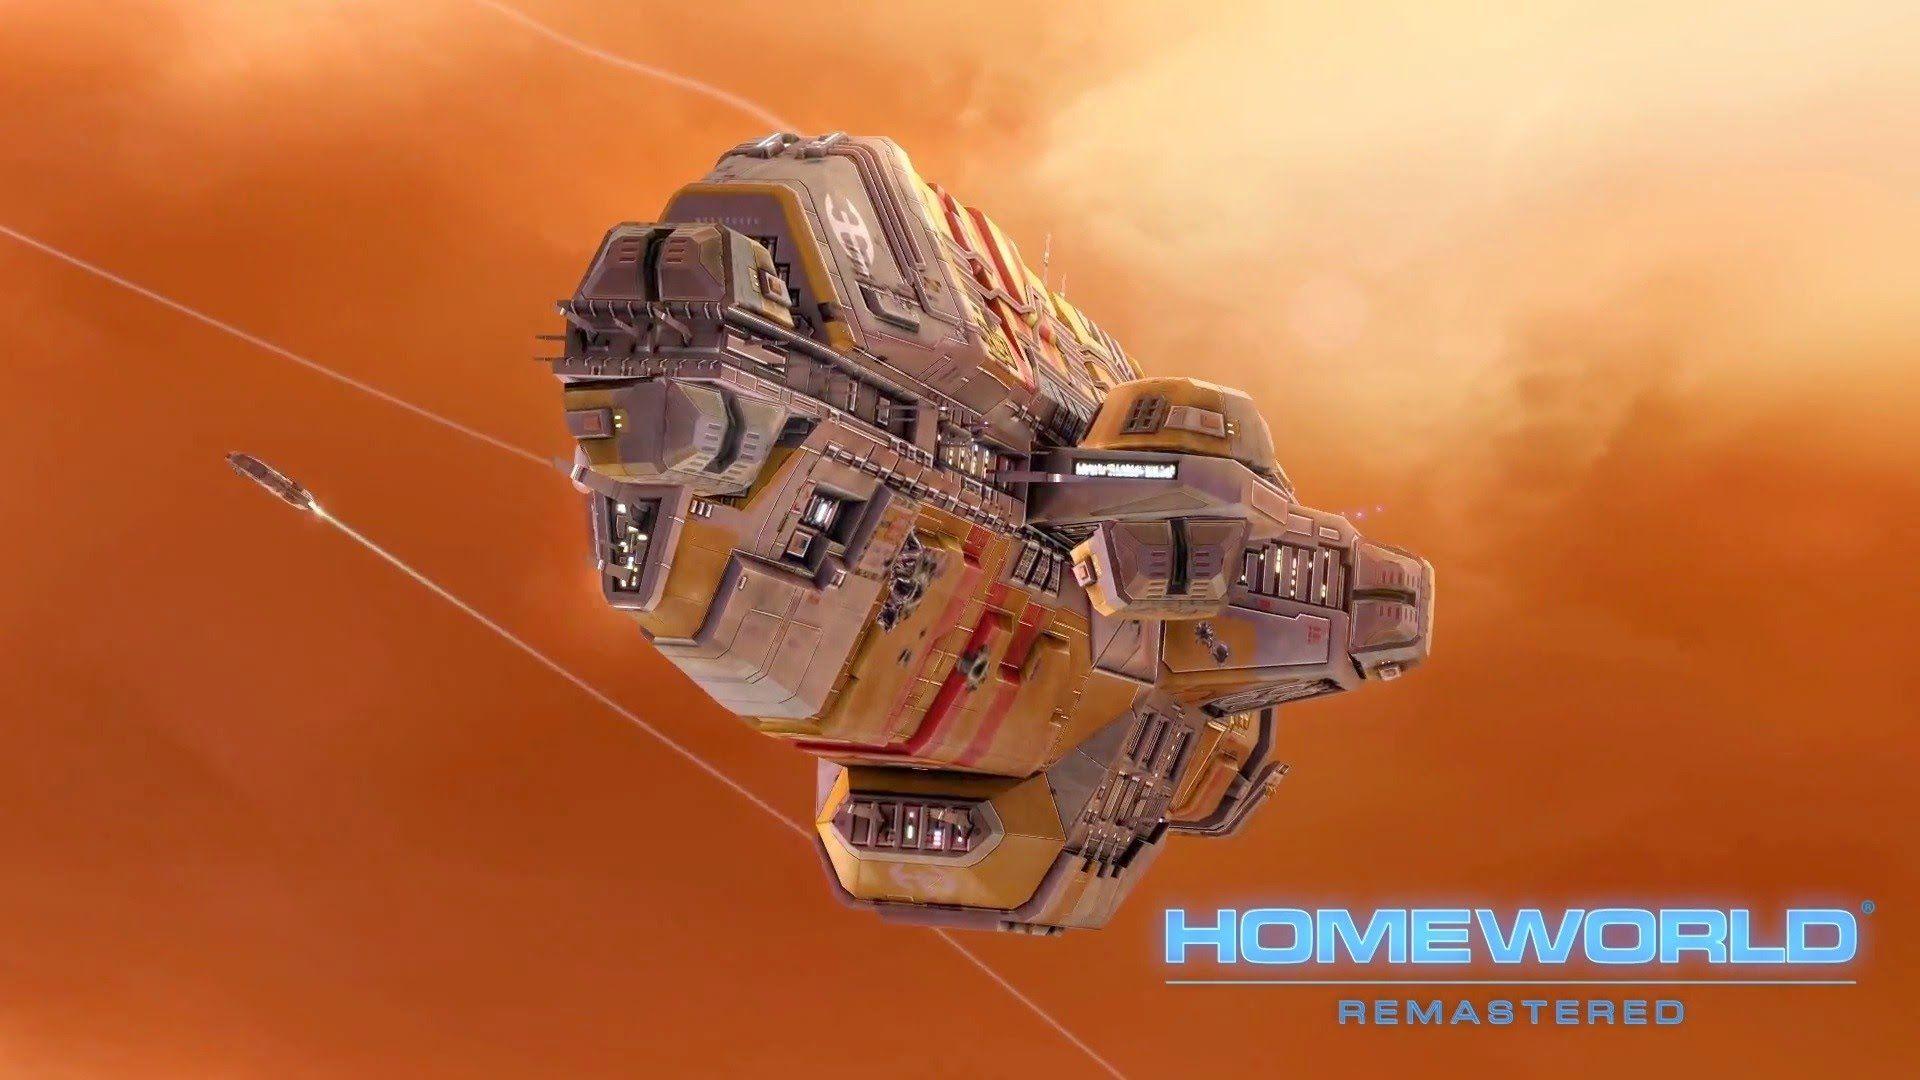 Homeworld: Remastered Review